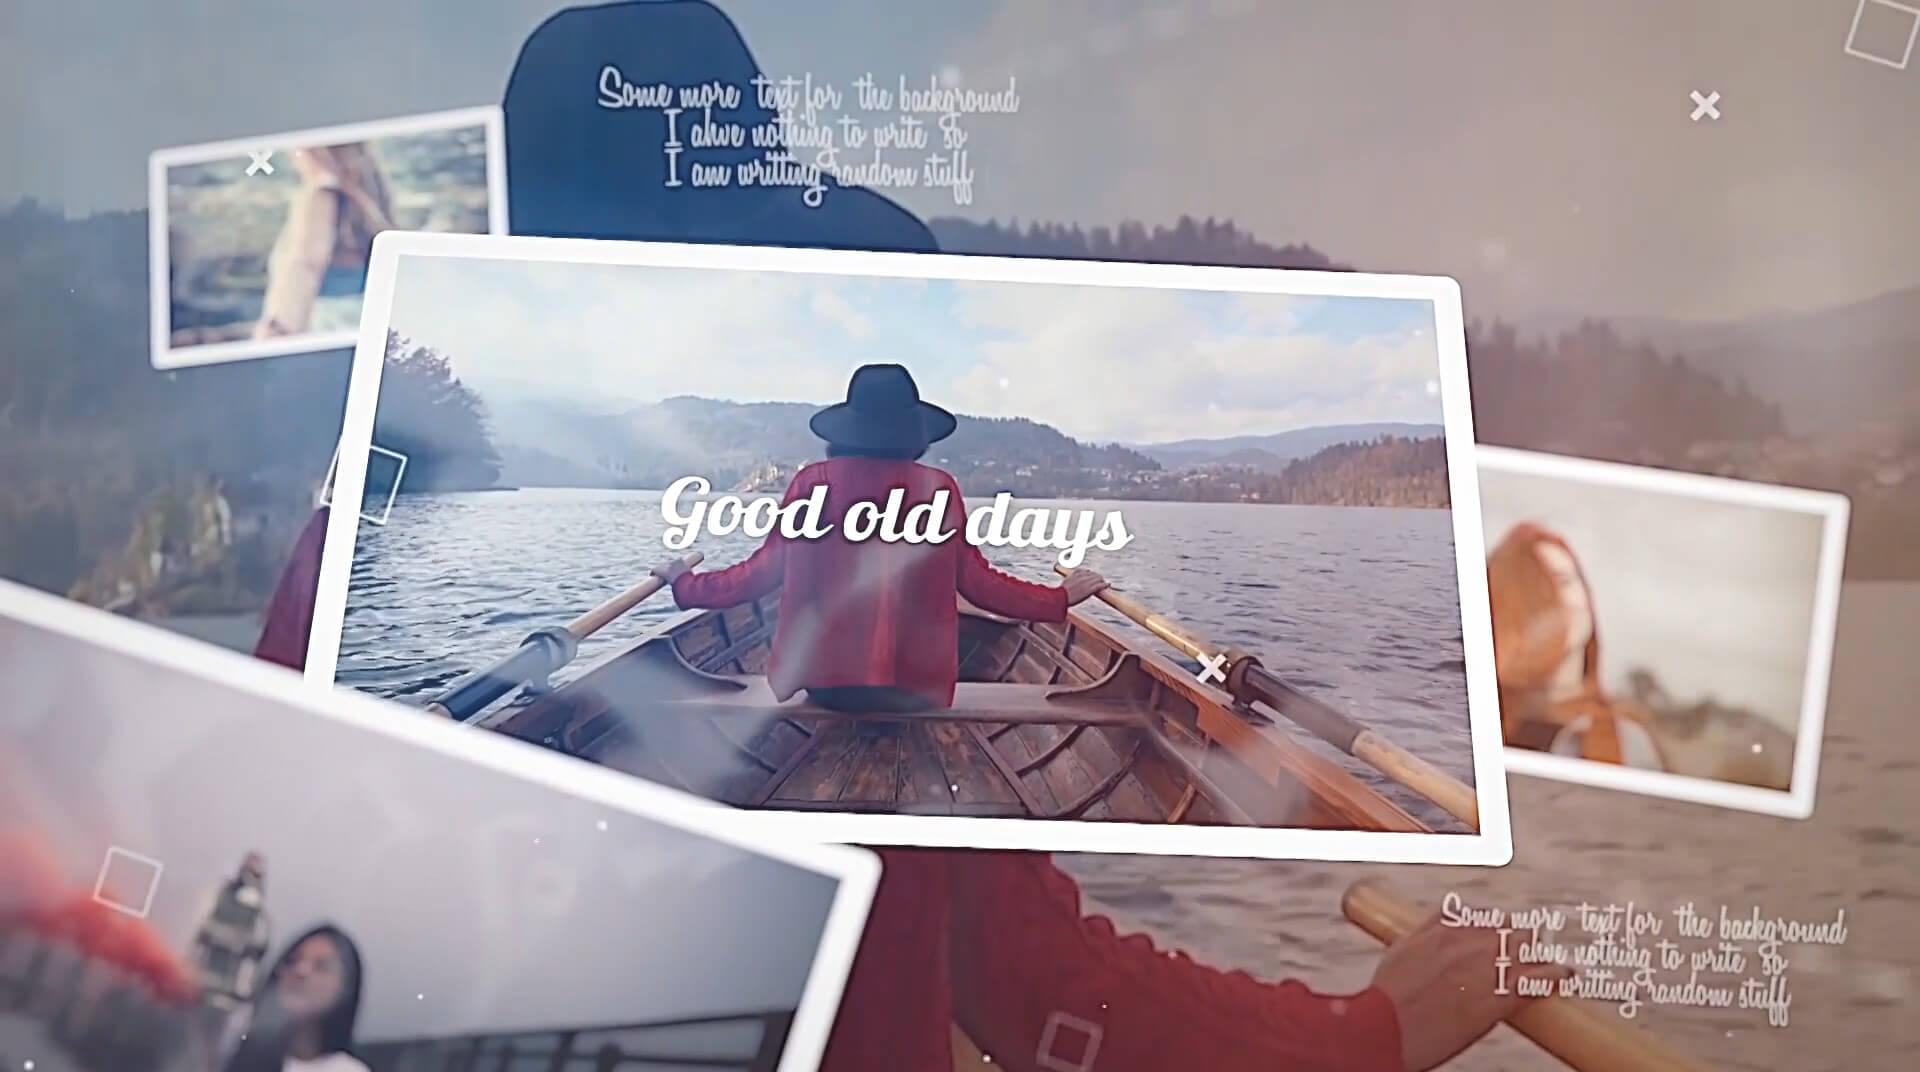 Fcpx主题模板 美好的旧时光唯美浪漫照片视频相册展示模板 Good old days